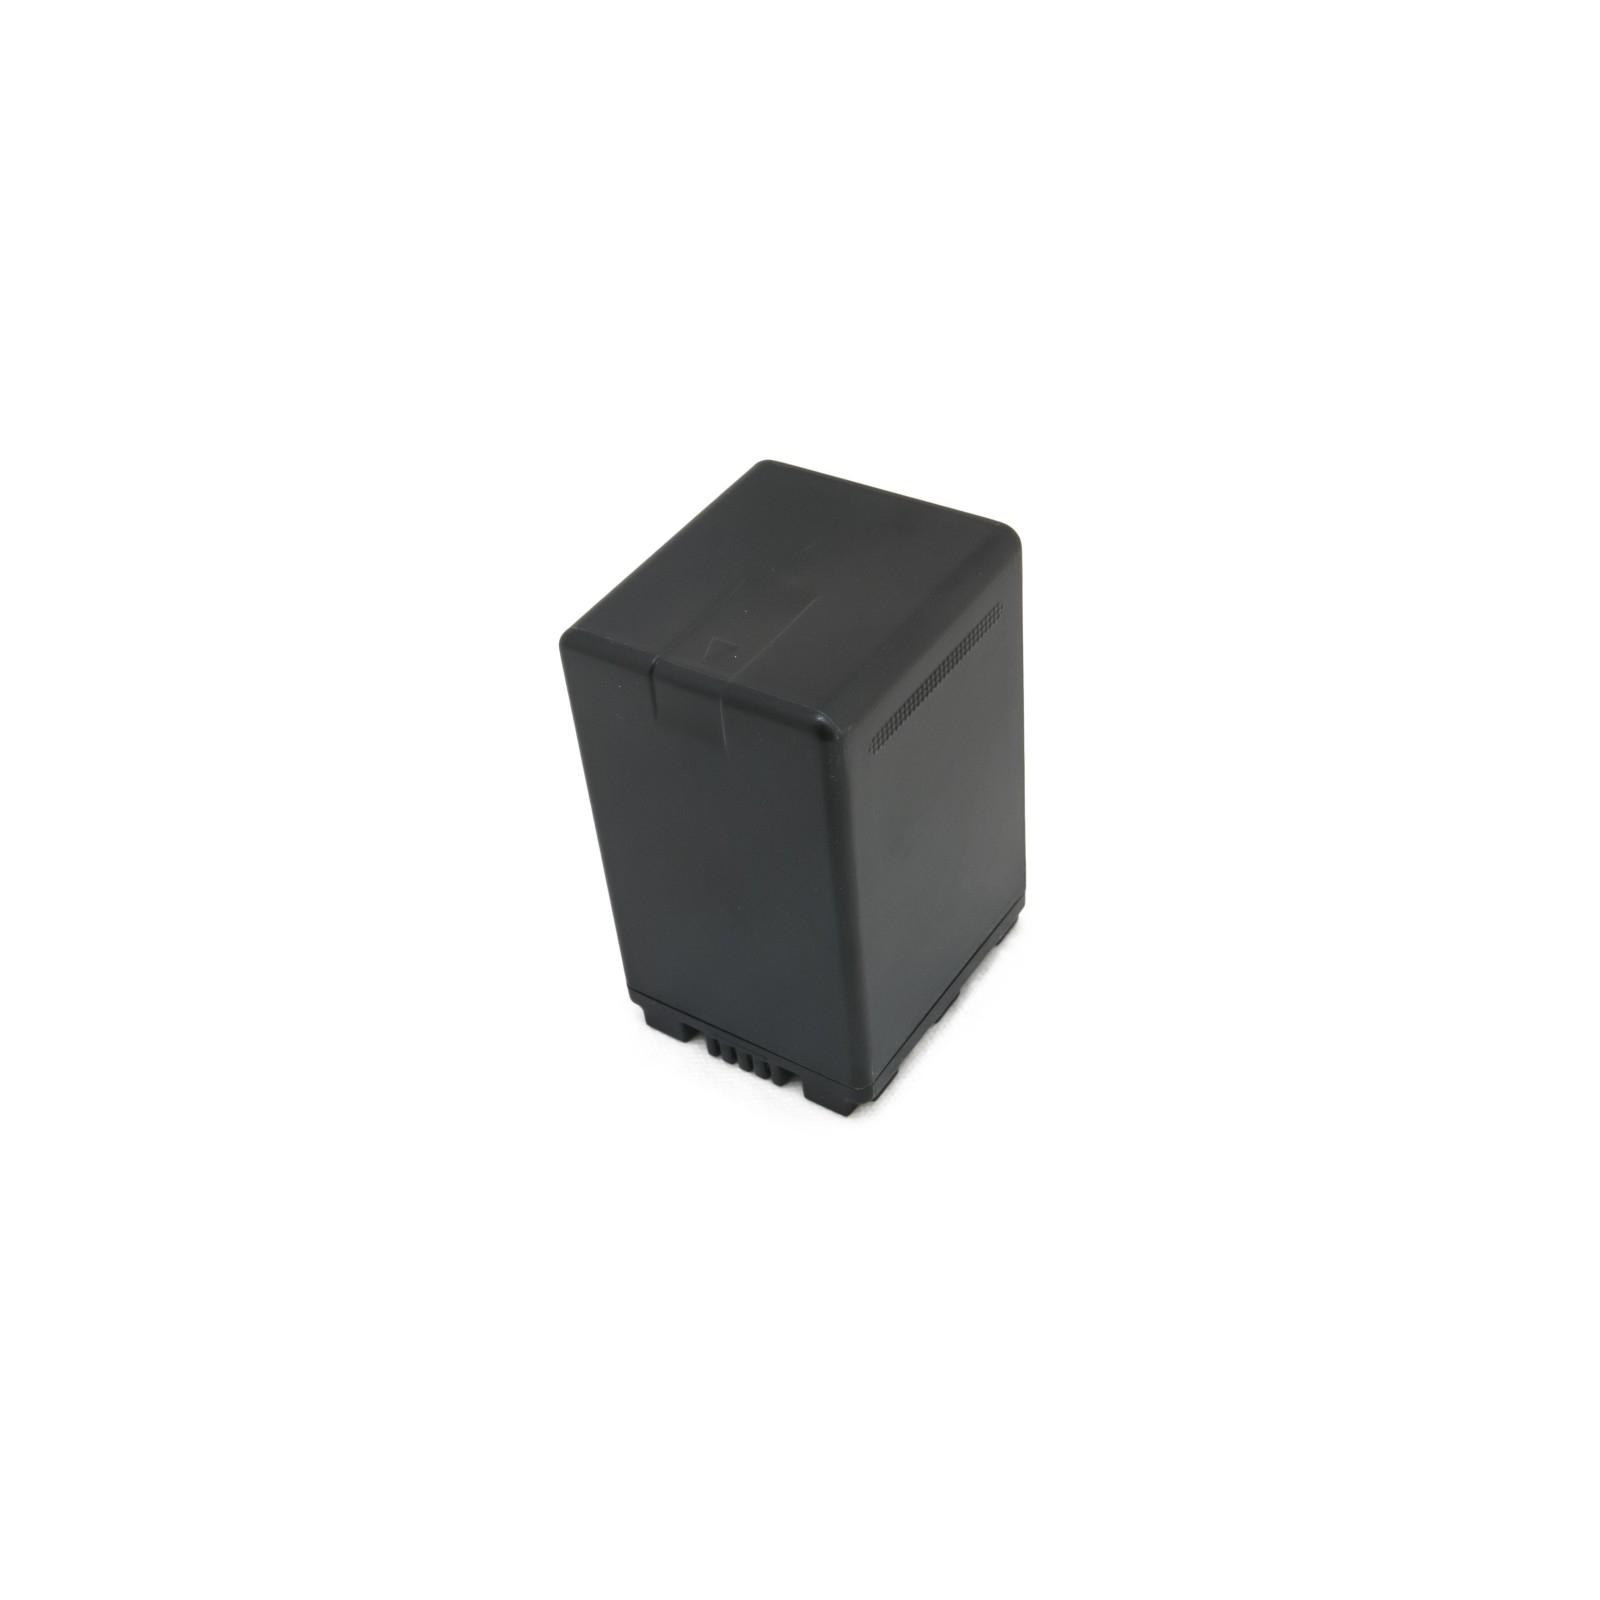 Аккумулятор к фото/видео EXTRADIGITAL Panasonic VW-VBN390 (DV00DV1365) изображение 5